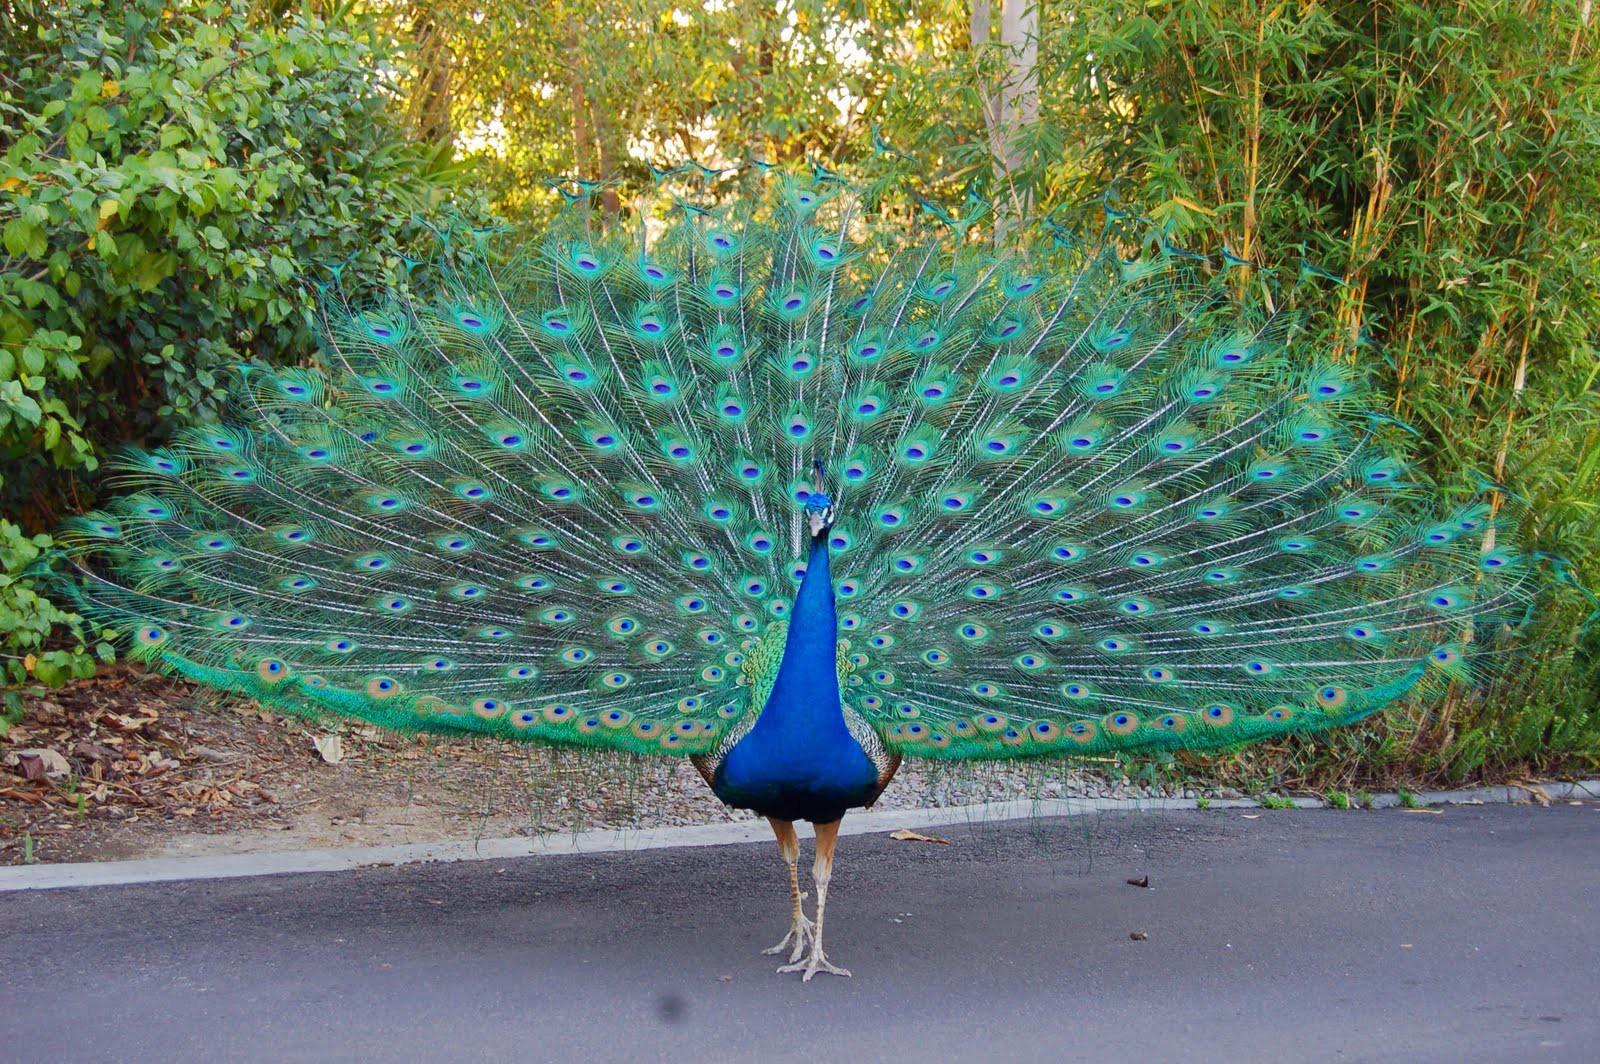 Bird peacock information